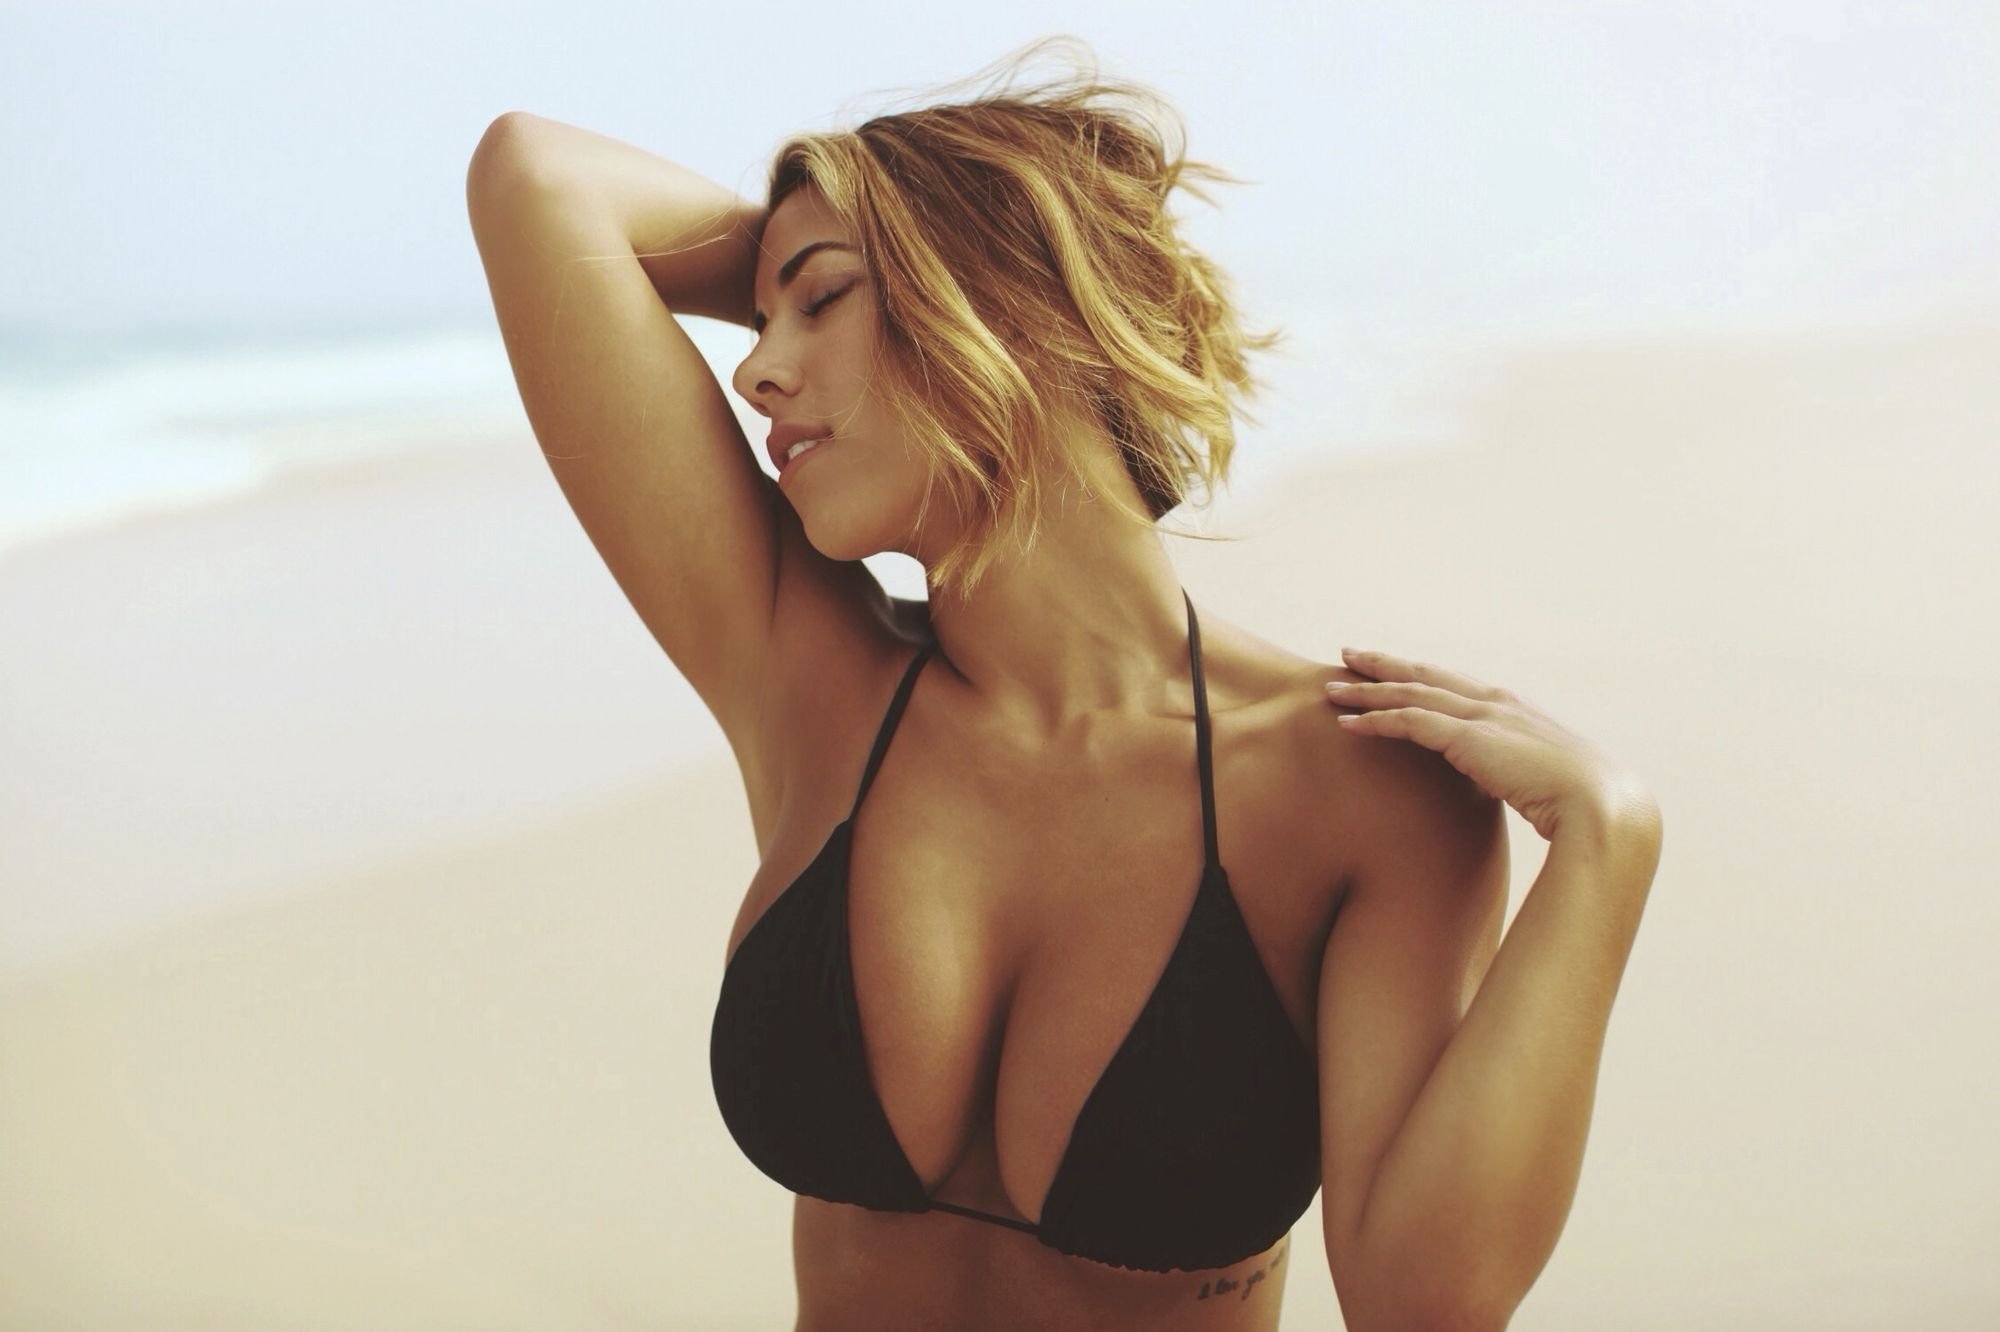 Pussy Bikini Jasmine Tosh naked photo 2017